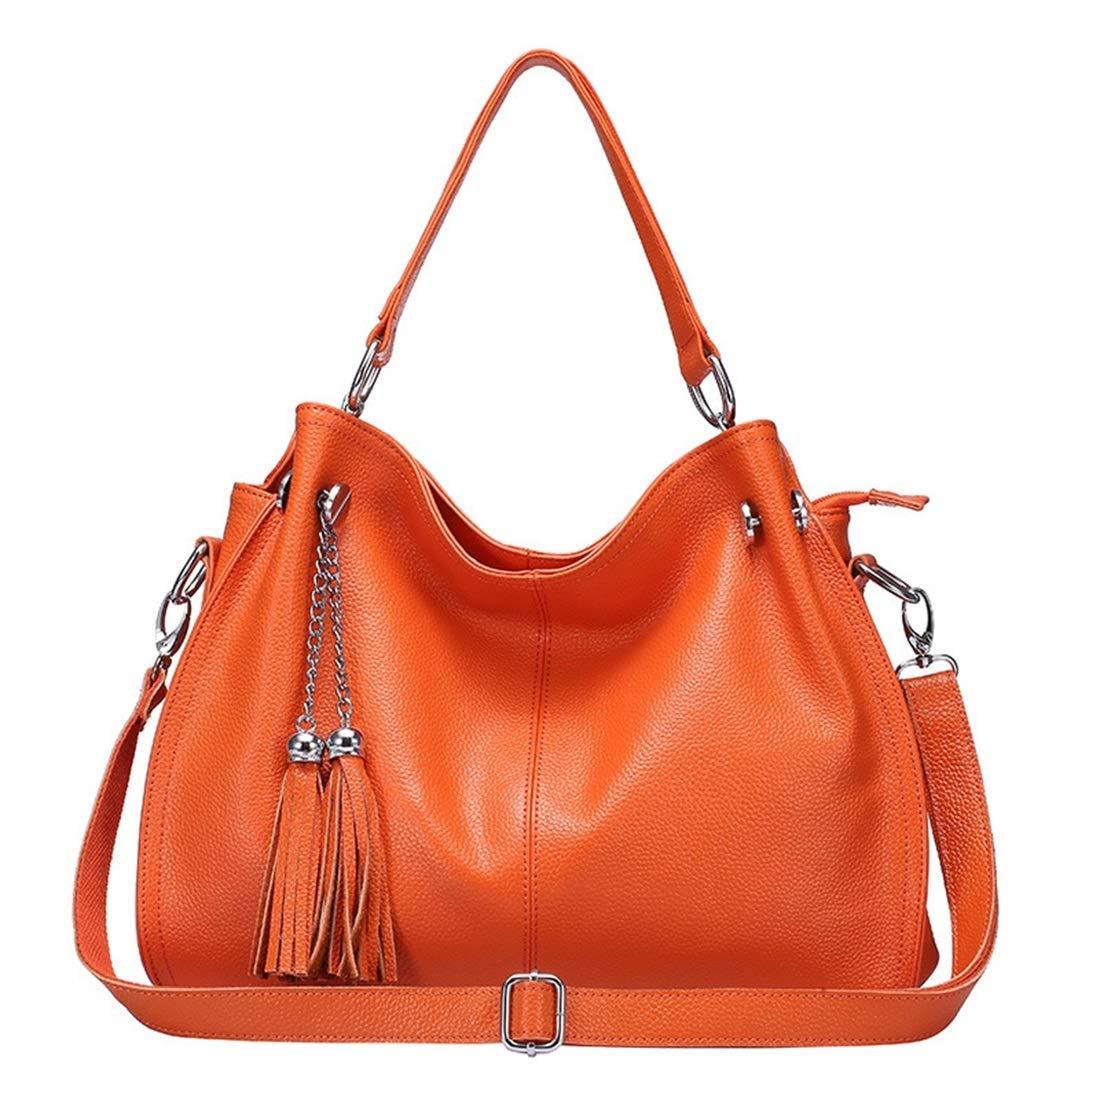 Sopetify Elegant Minimalist Style Casual Tassel Leather Bag Shoulder Messenger Messenger Bag Large Capacity Womens Totes Bags Color : Orange